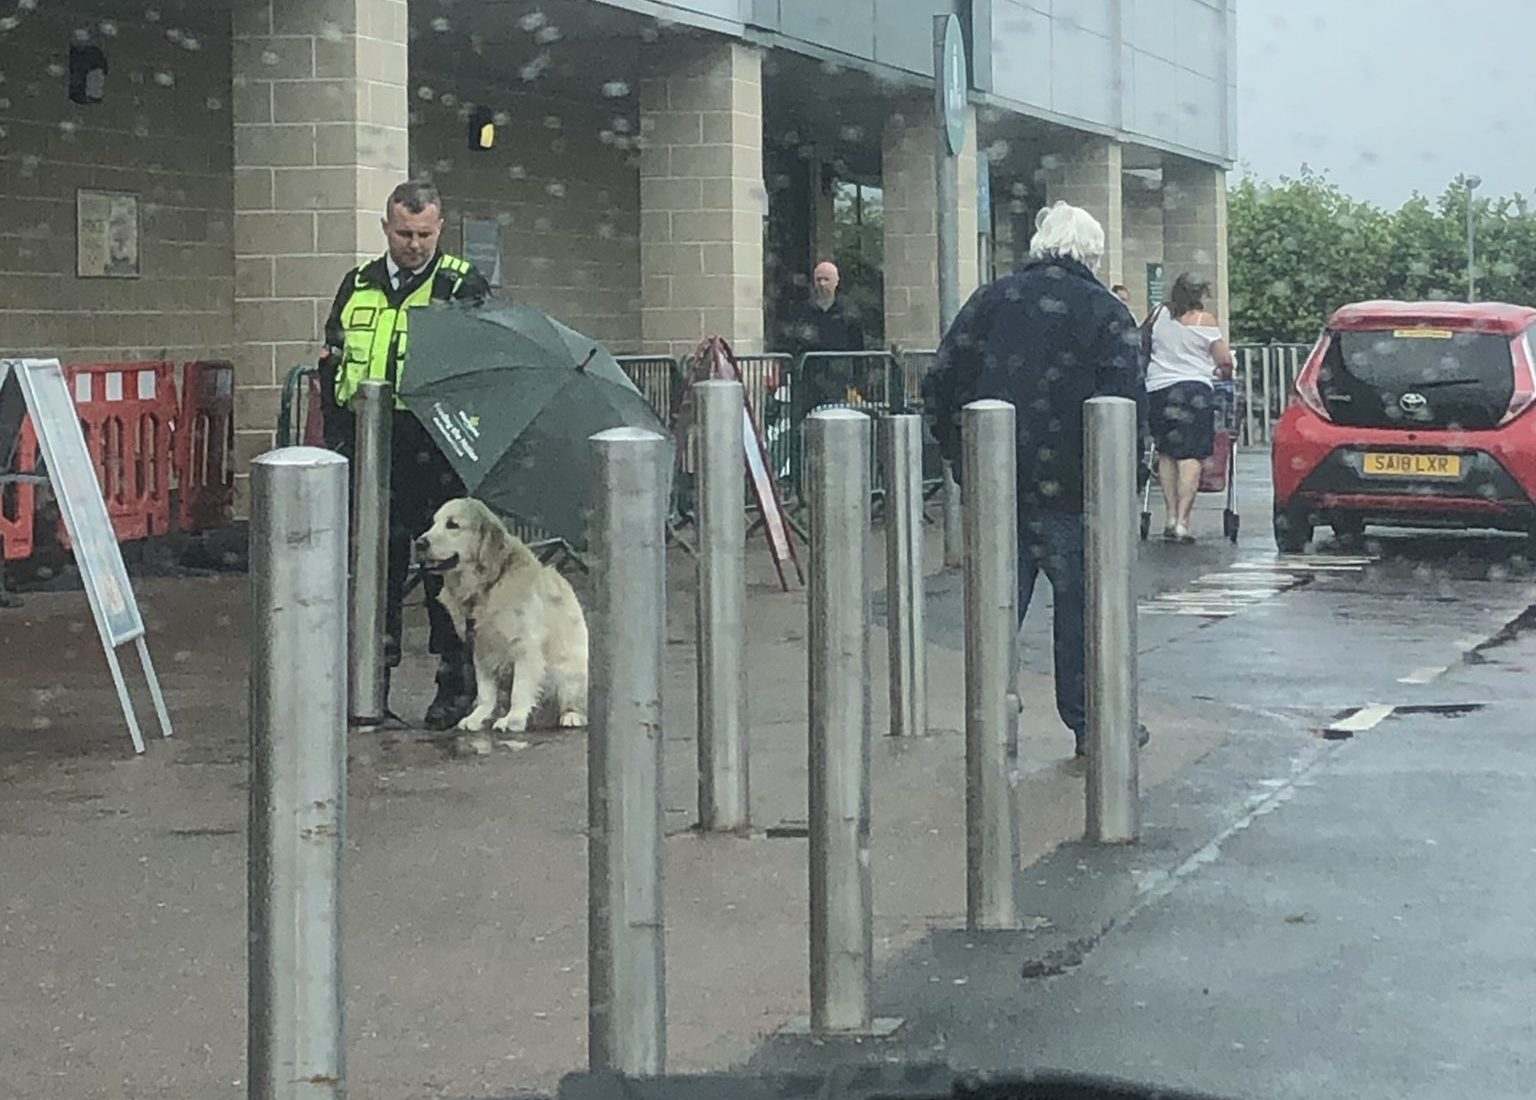 Good Samaritan Security Guard Shows Love to Canine During Rain Storm